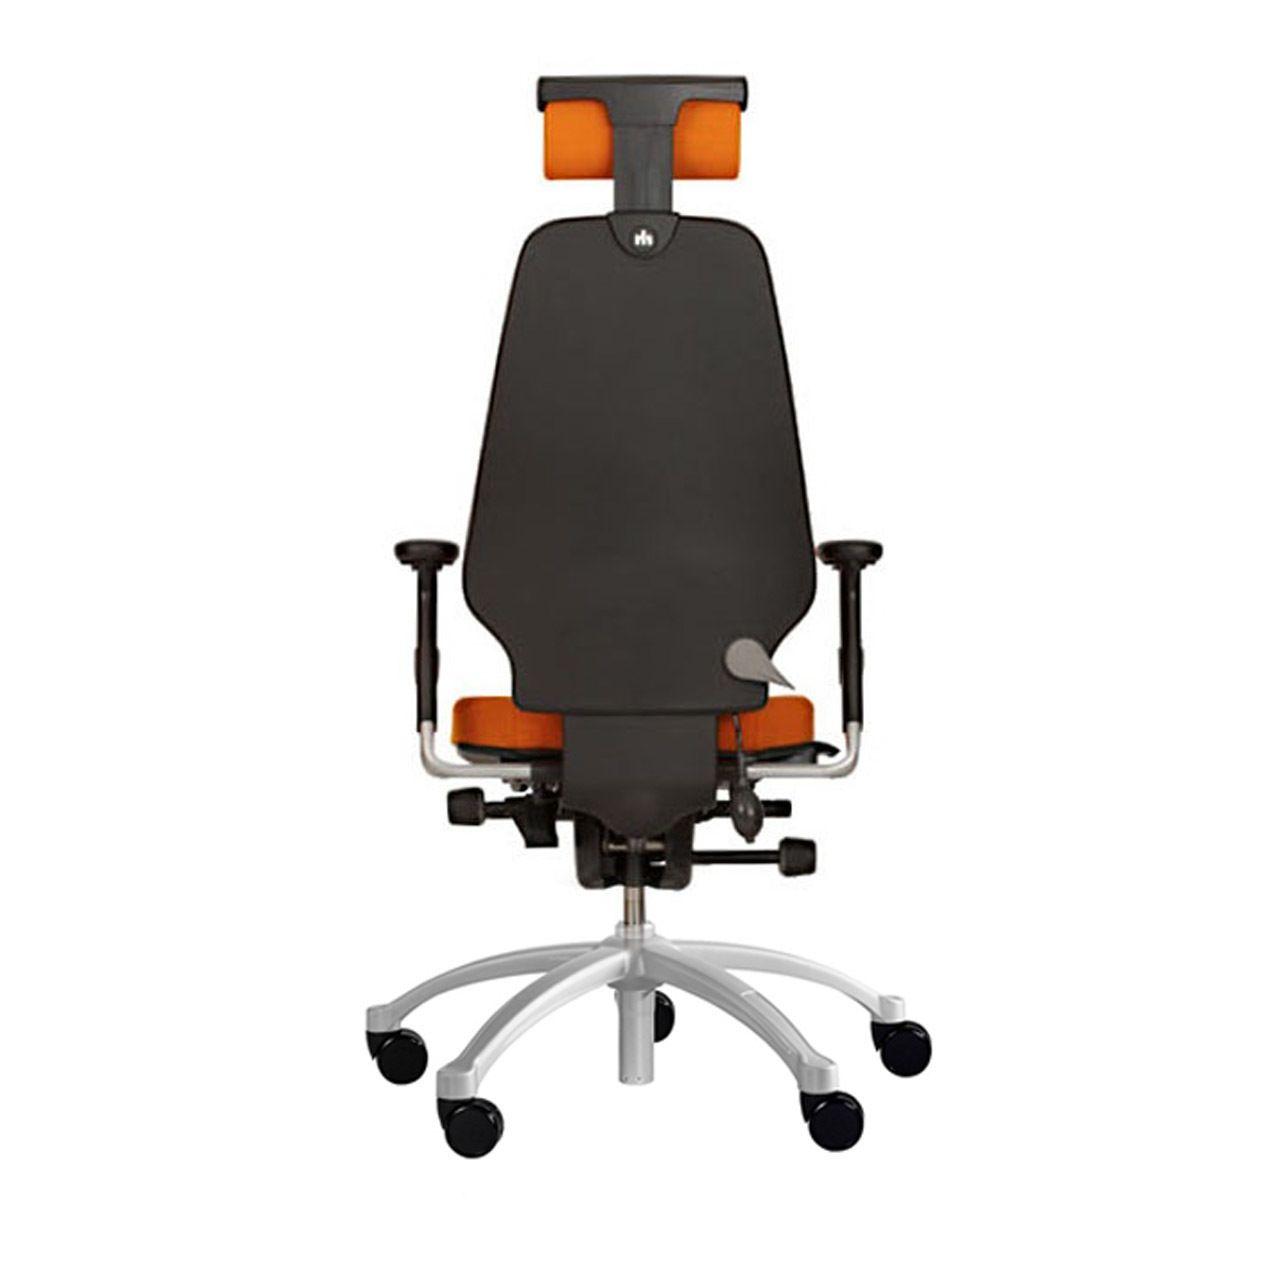 RH Logic 400 ergonomische bureaustoel achterkant